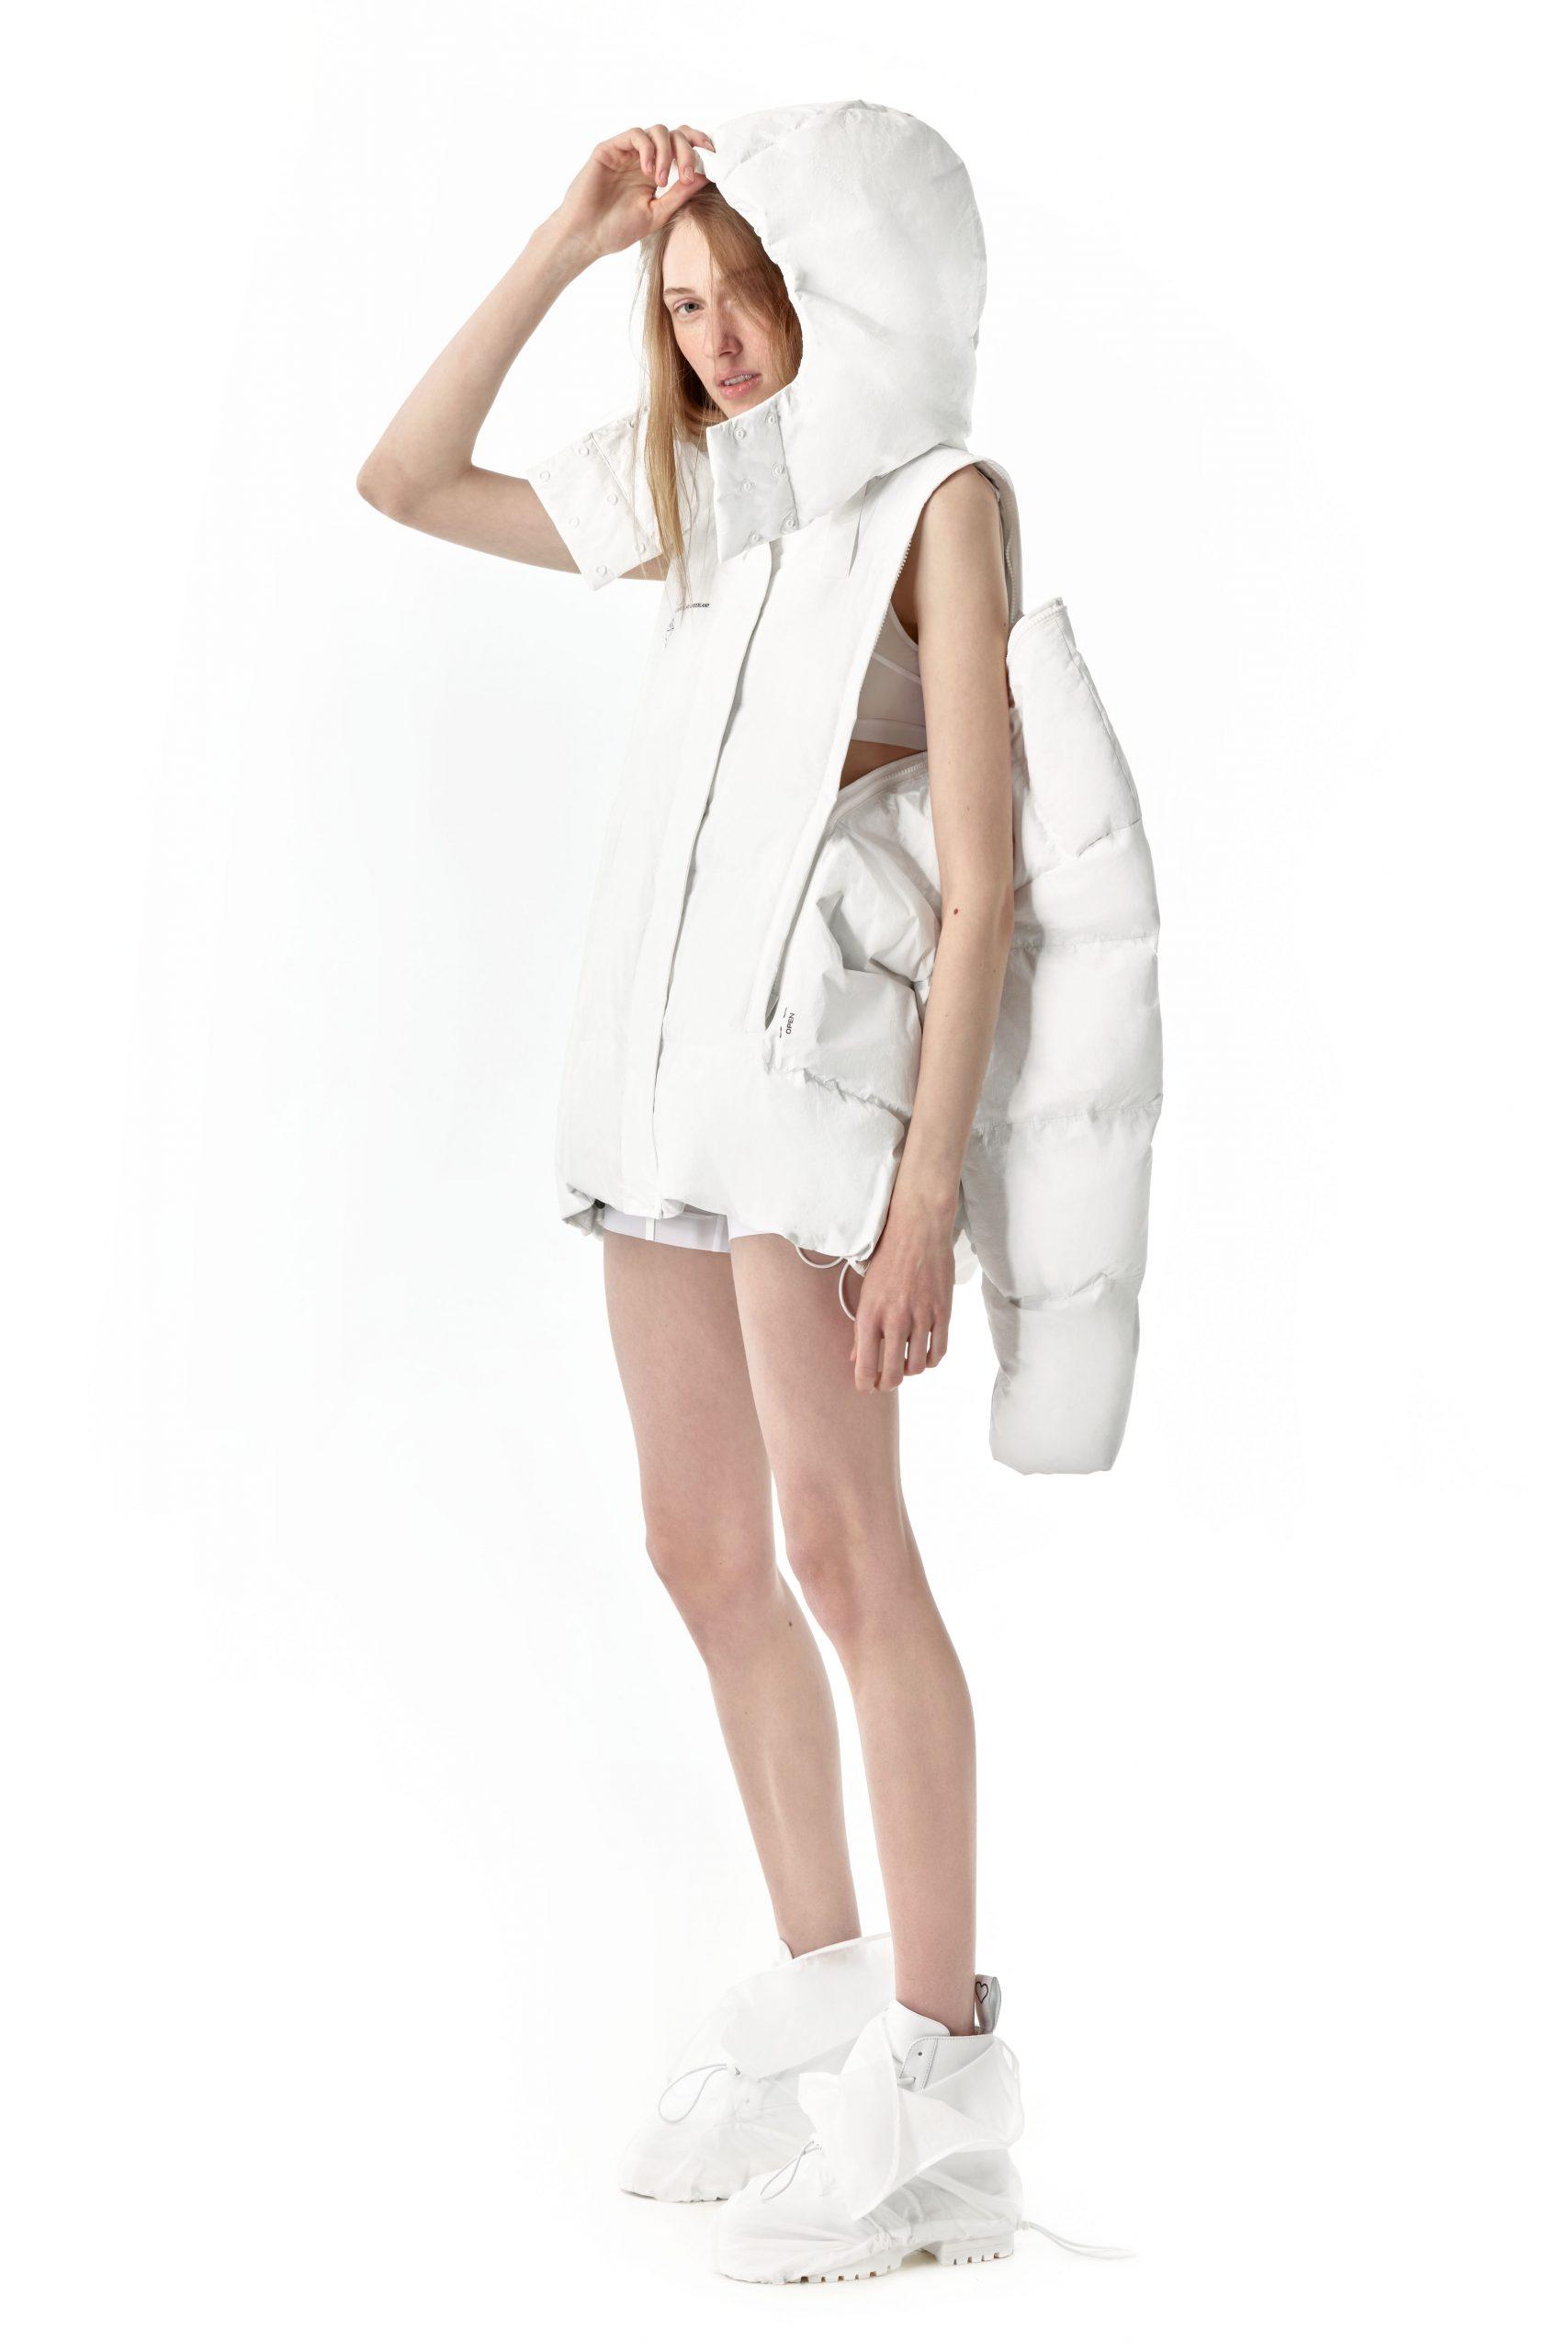 TTSWTRS Fall 2021 Fashion Show Photos